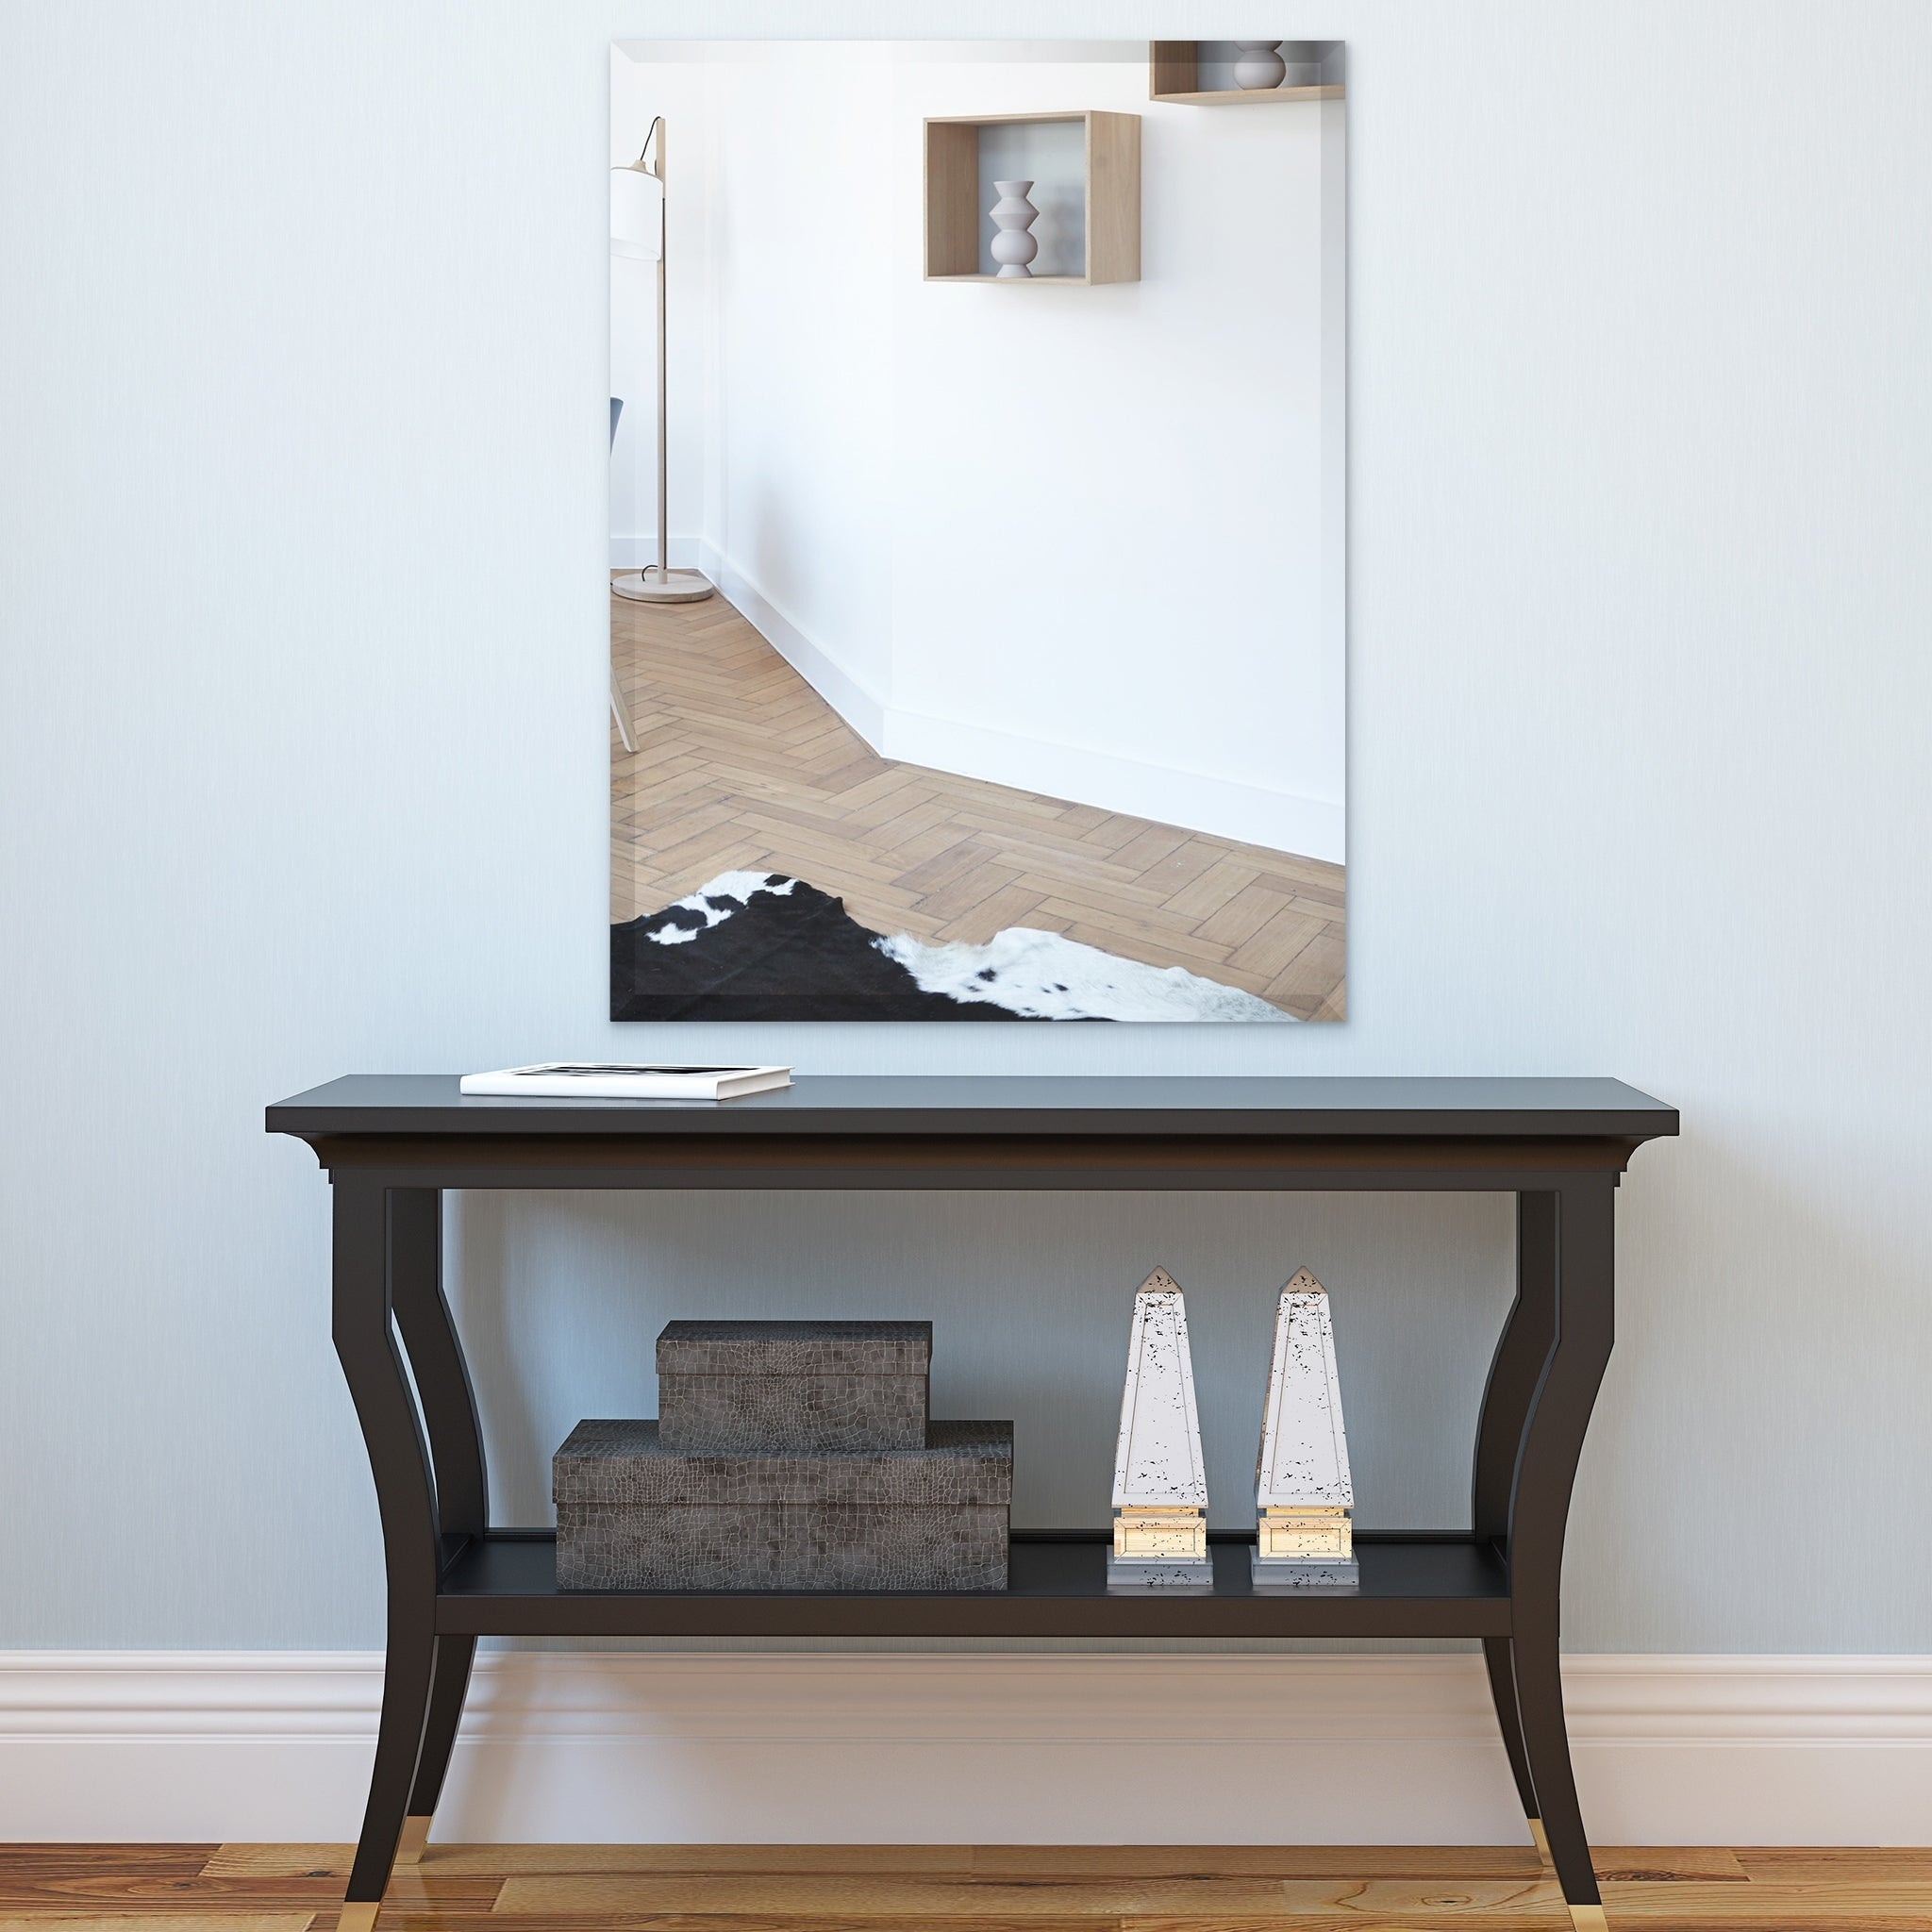 Porch Den Shawmut Frameless Beveled Prism Wall Mirror Overstock 29964416